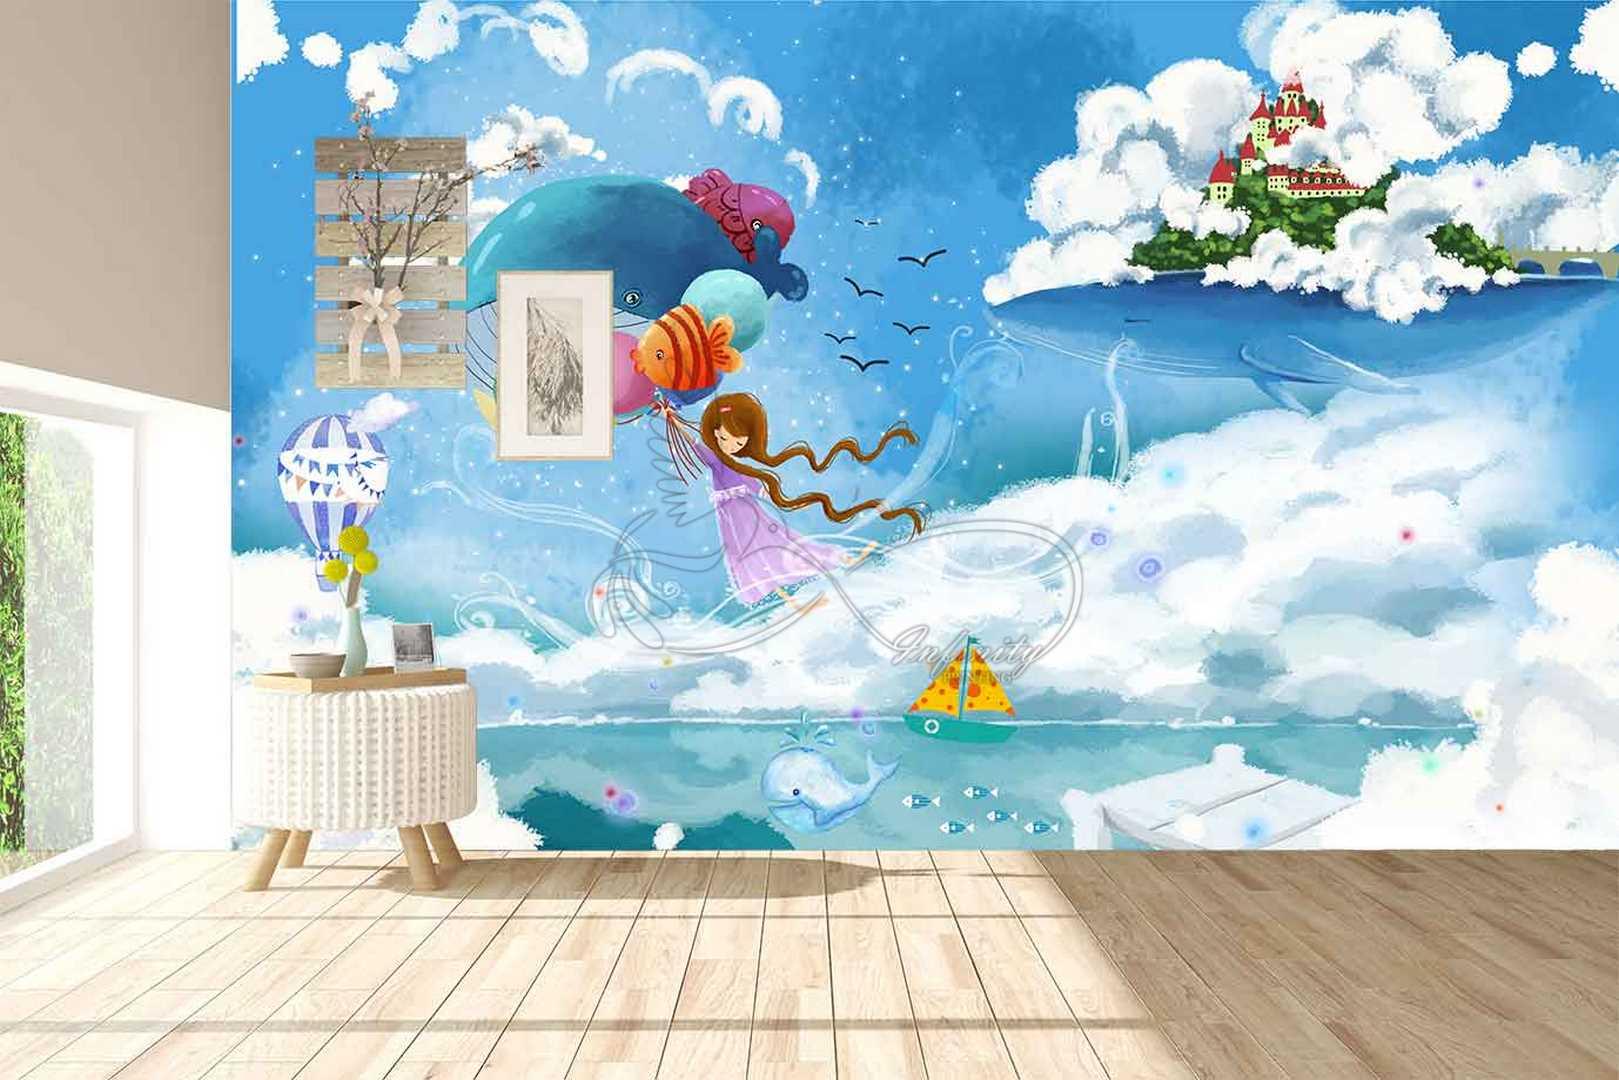 Fantasy child room design wall poster printing code 3133